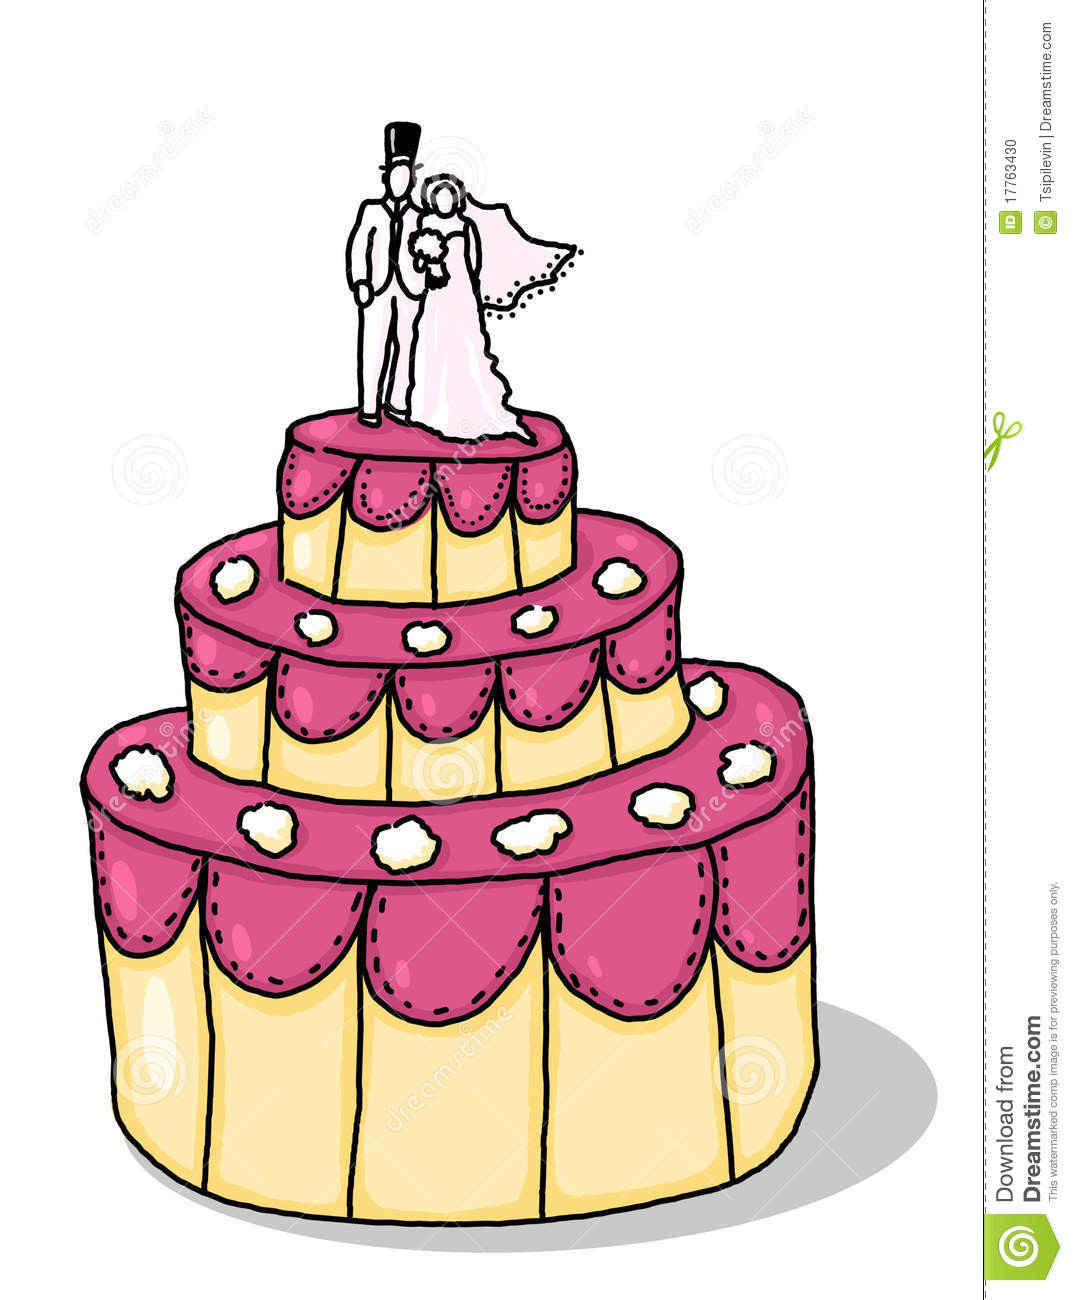 Cartoon Wedding Cakes  Drawn wedding cake cartoon Pencil and in color drawn